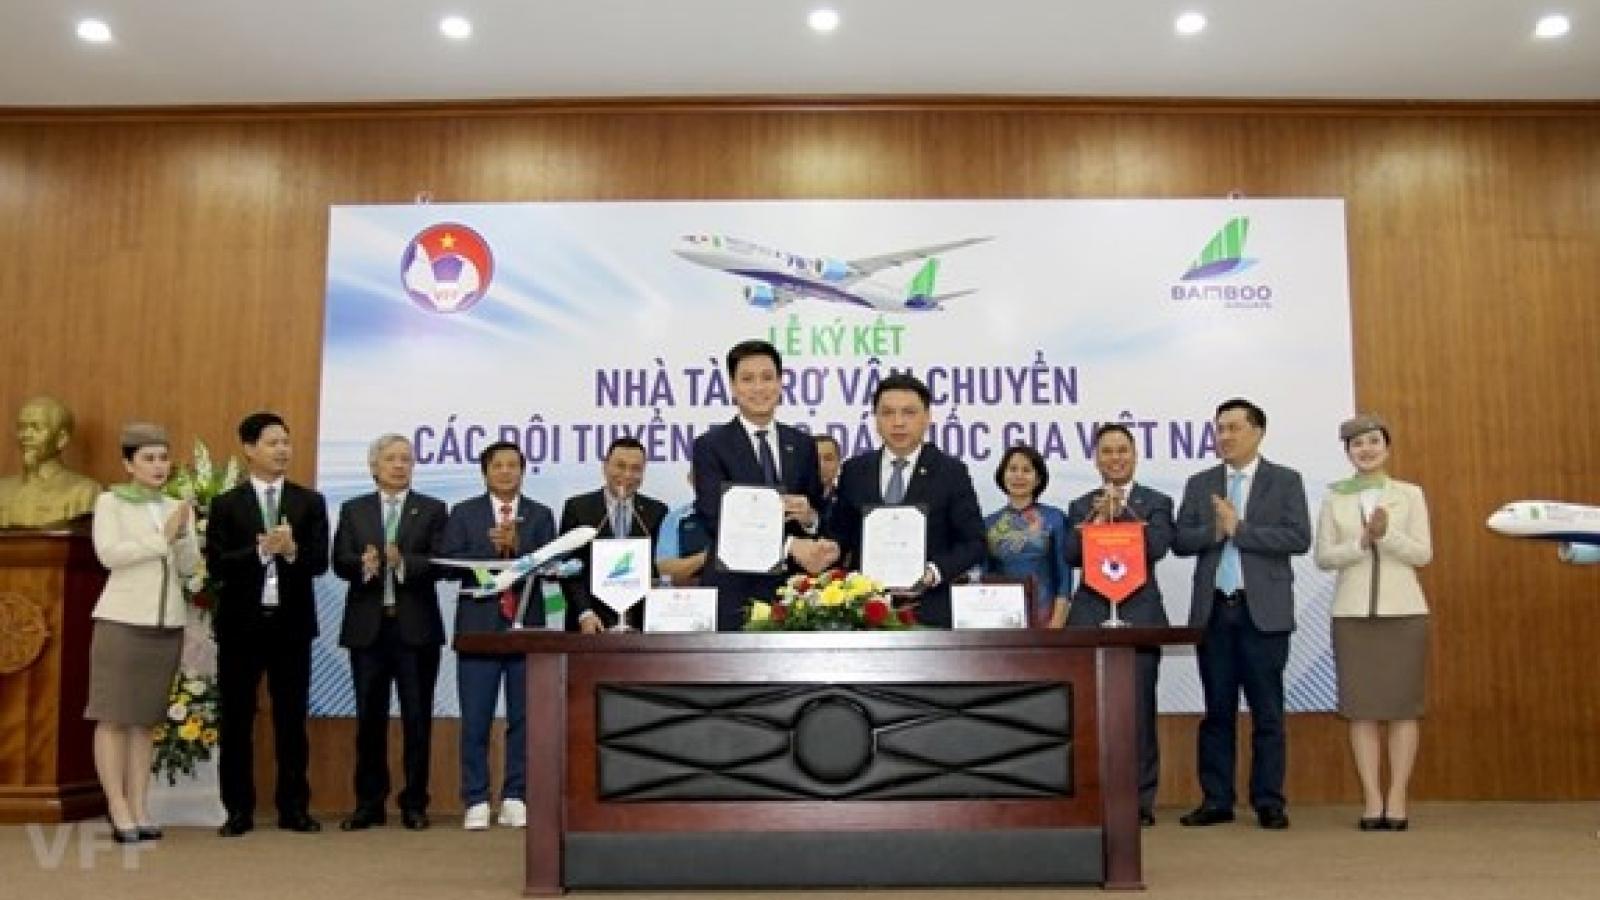 Bamboo Airways sponsors national football, futsal teams